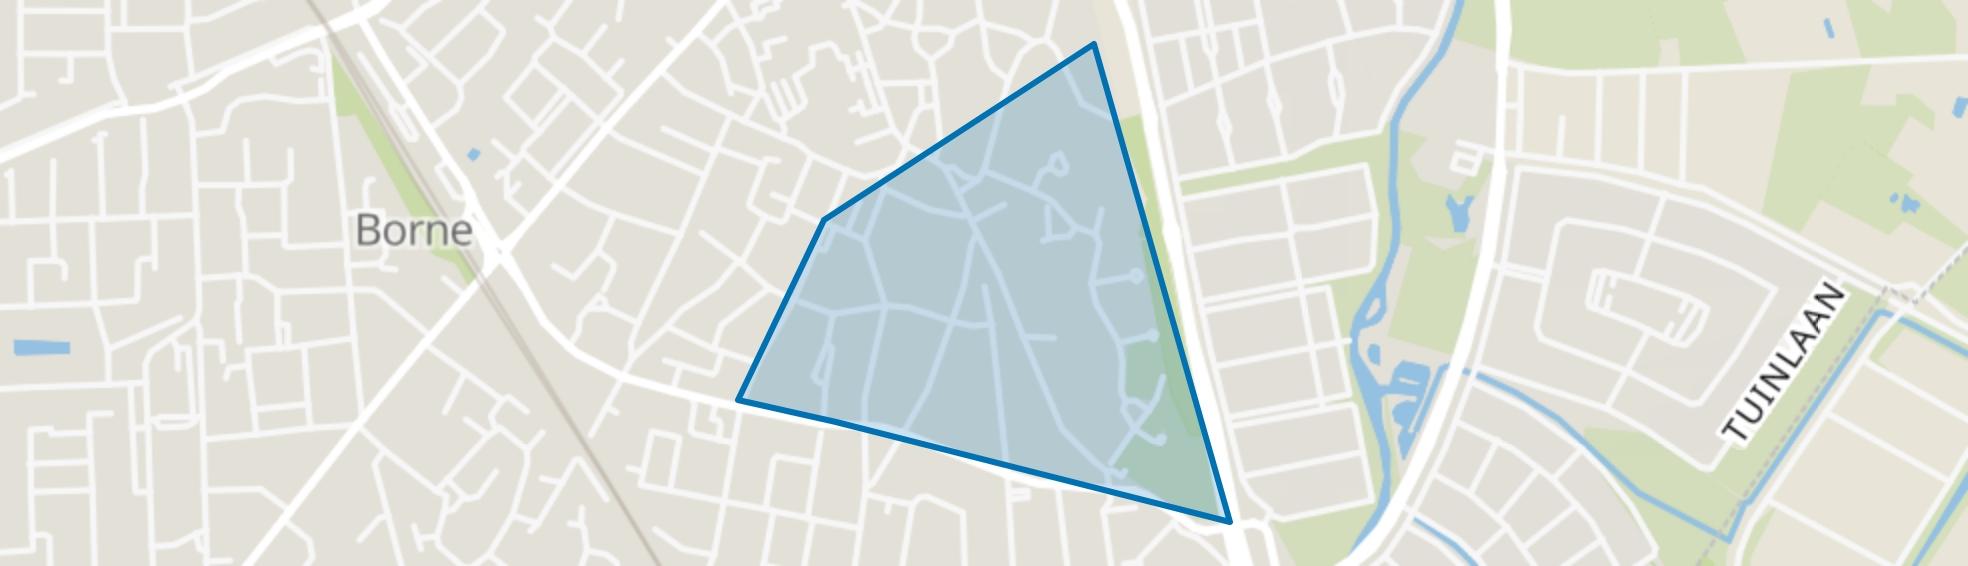 't Wensink Noord, Borne map